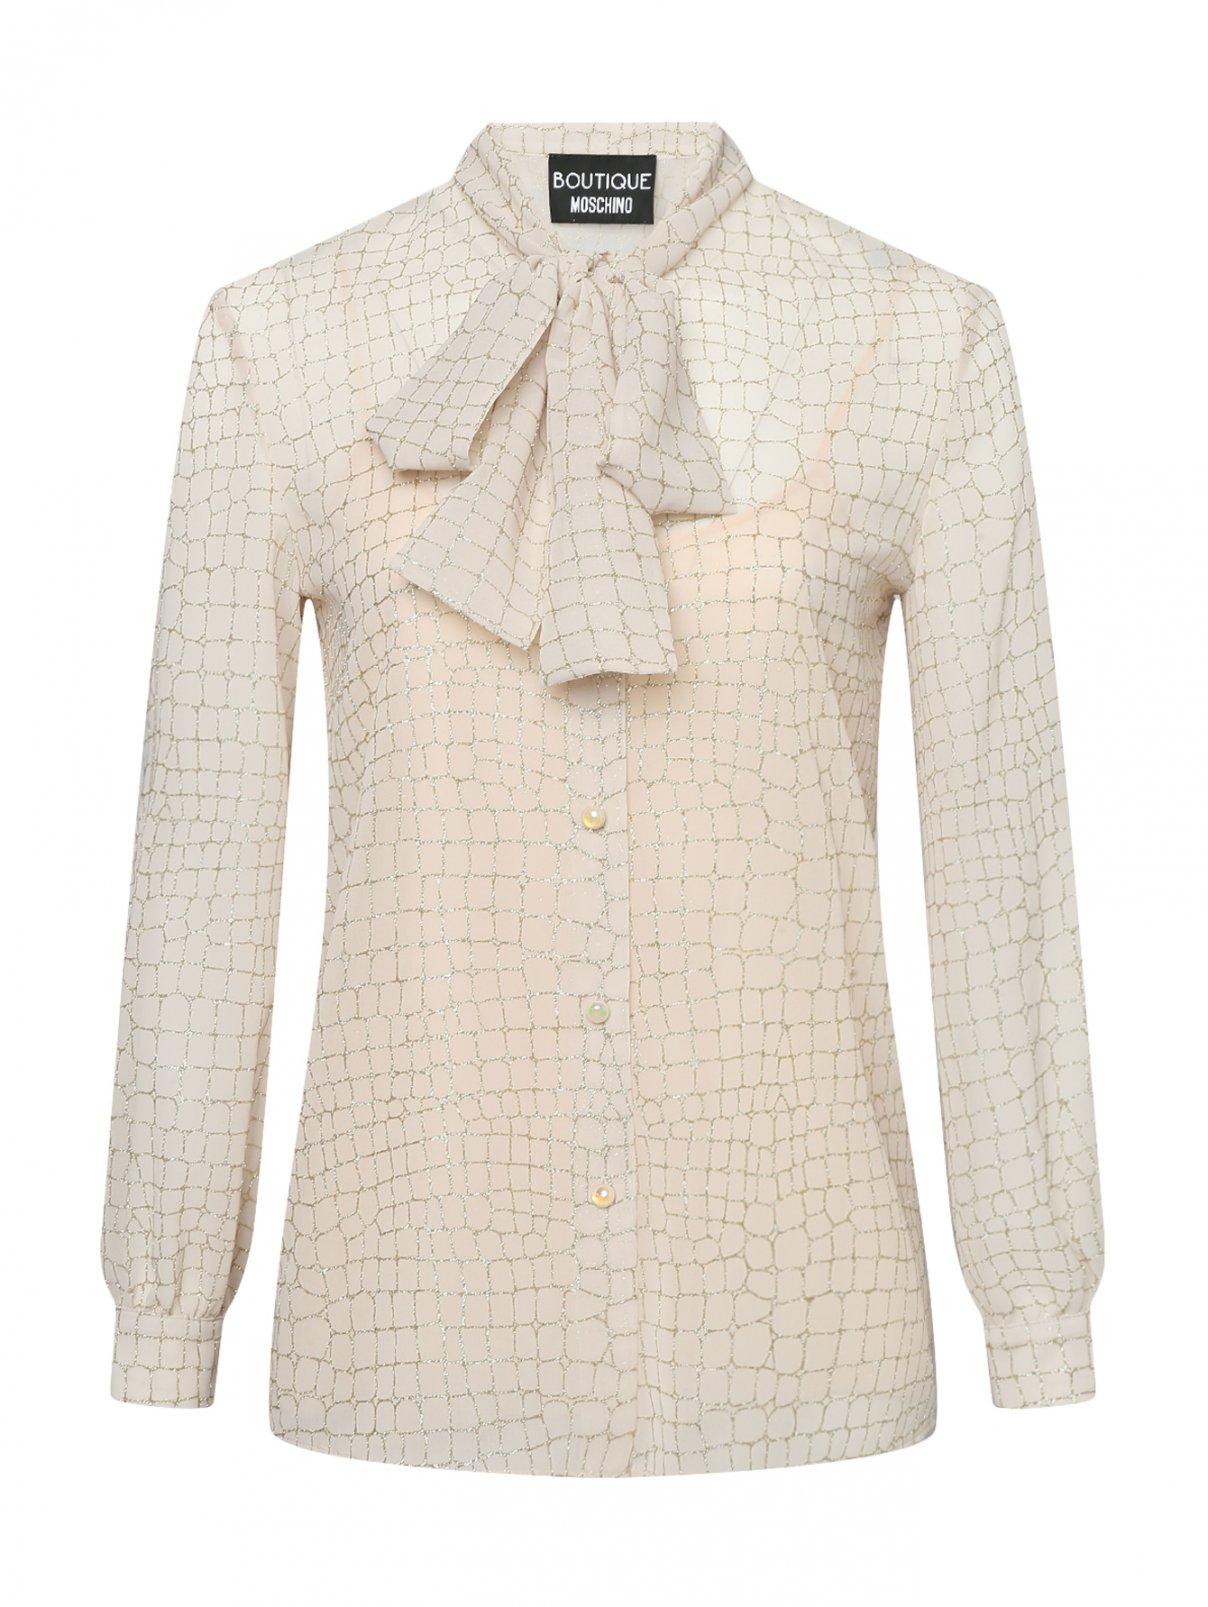 Блуза с узором Moschino Boutique  –  Общий вид